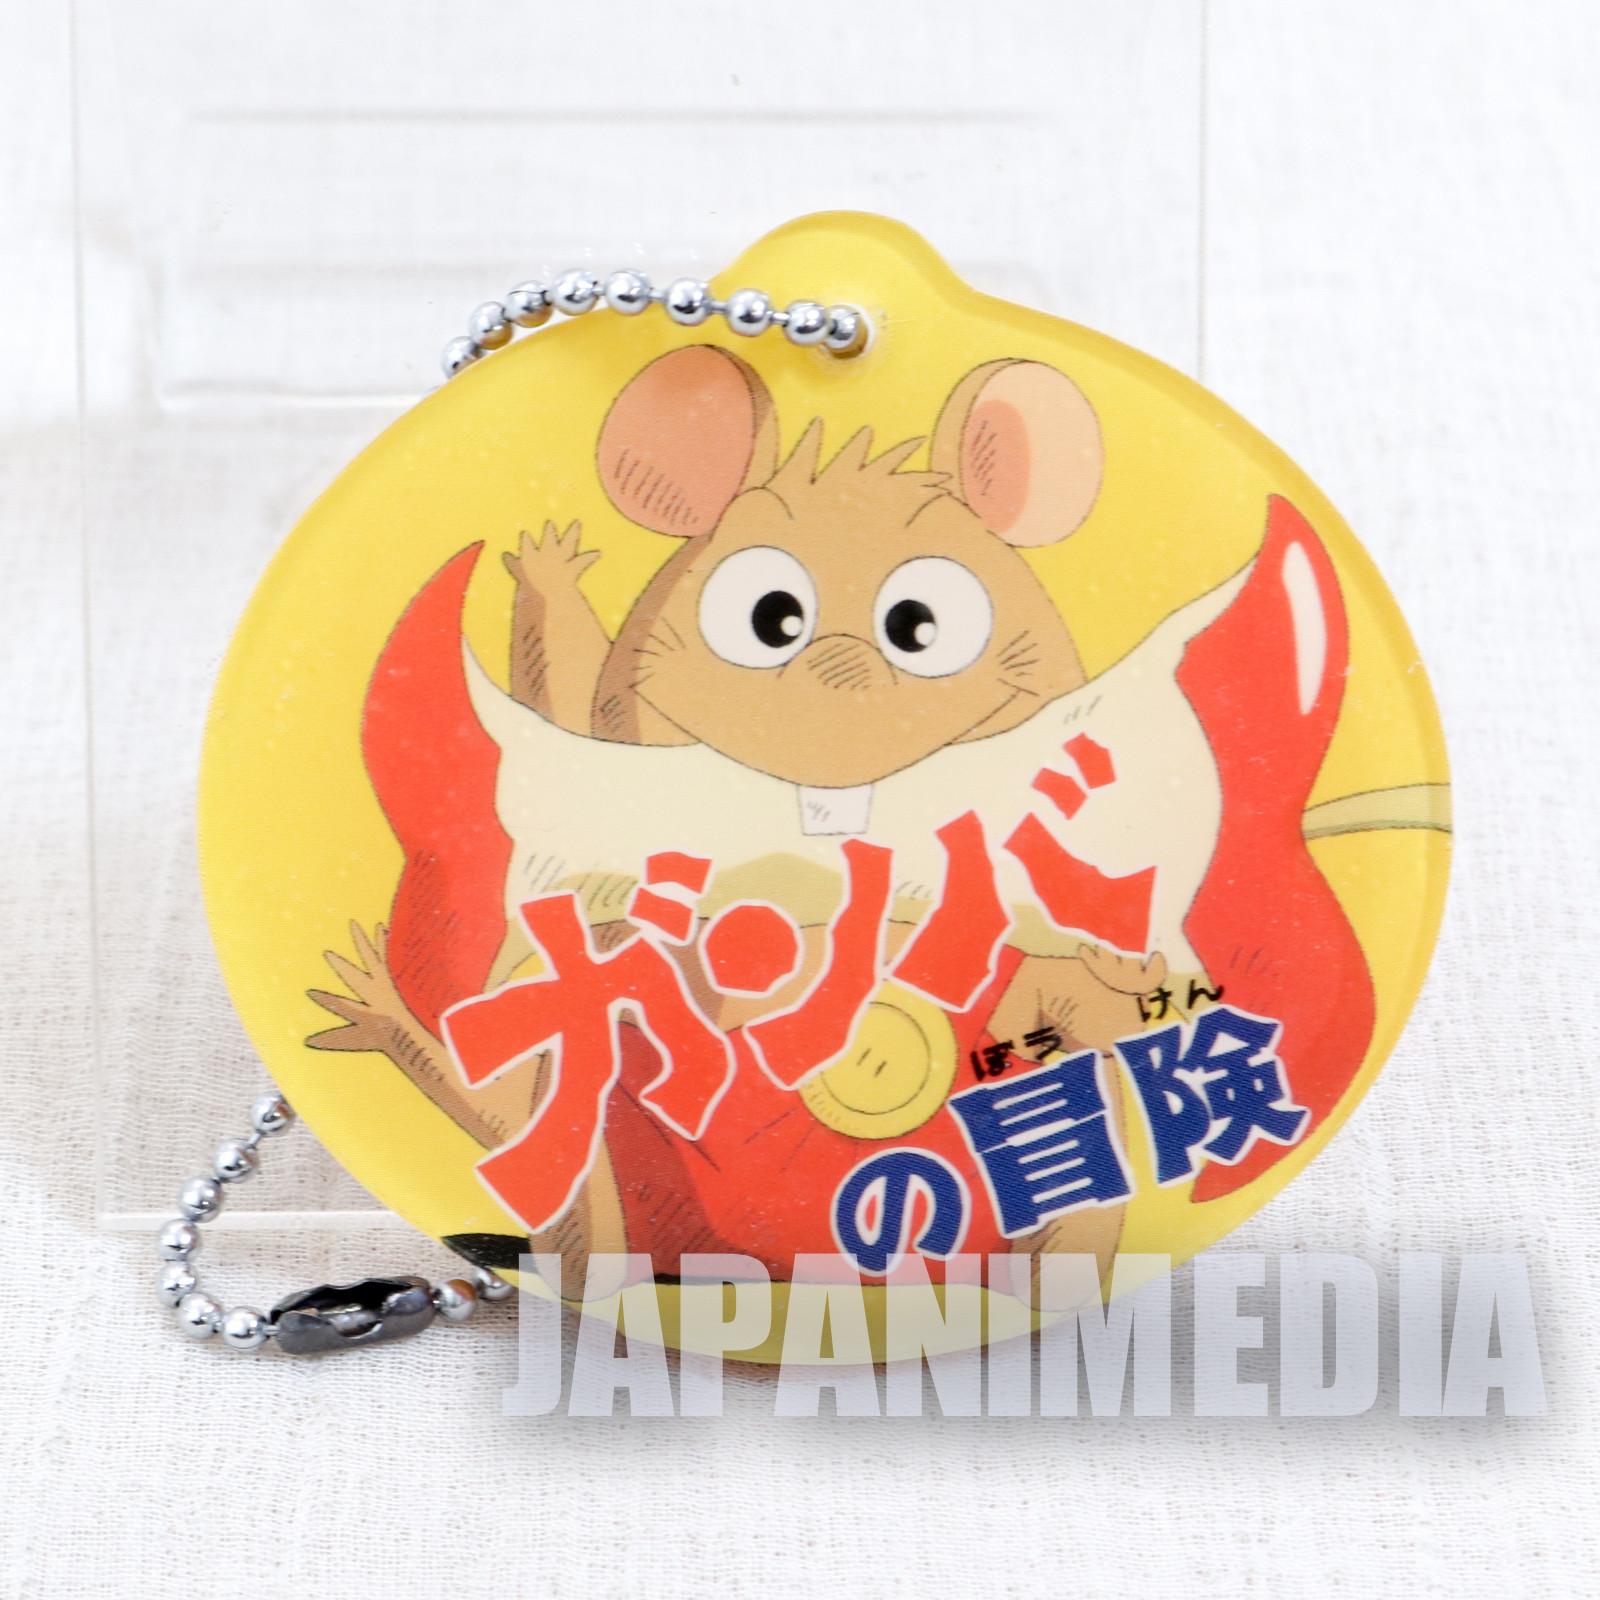 Gamba no Boken Gamba Rubber Mascot Ballchain JAPAN ANIME MANGA